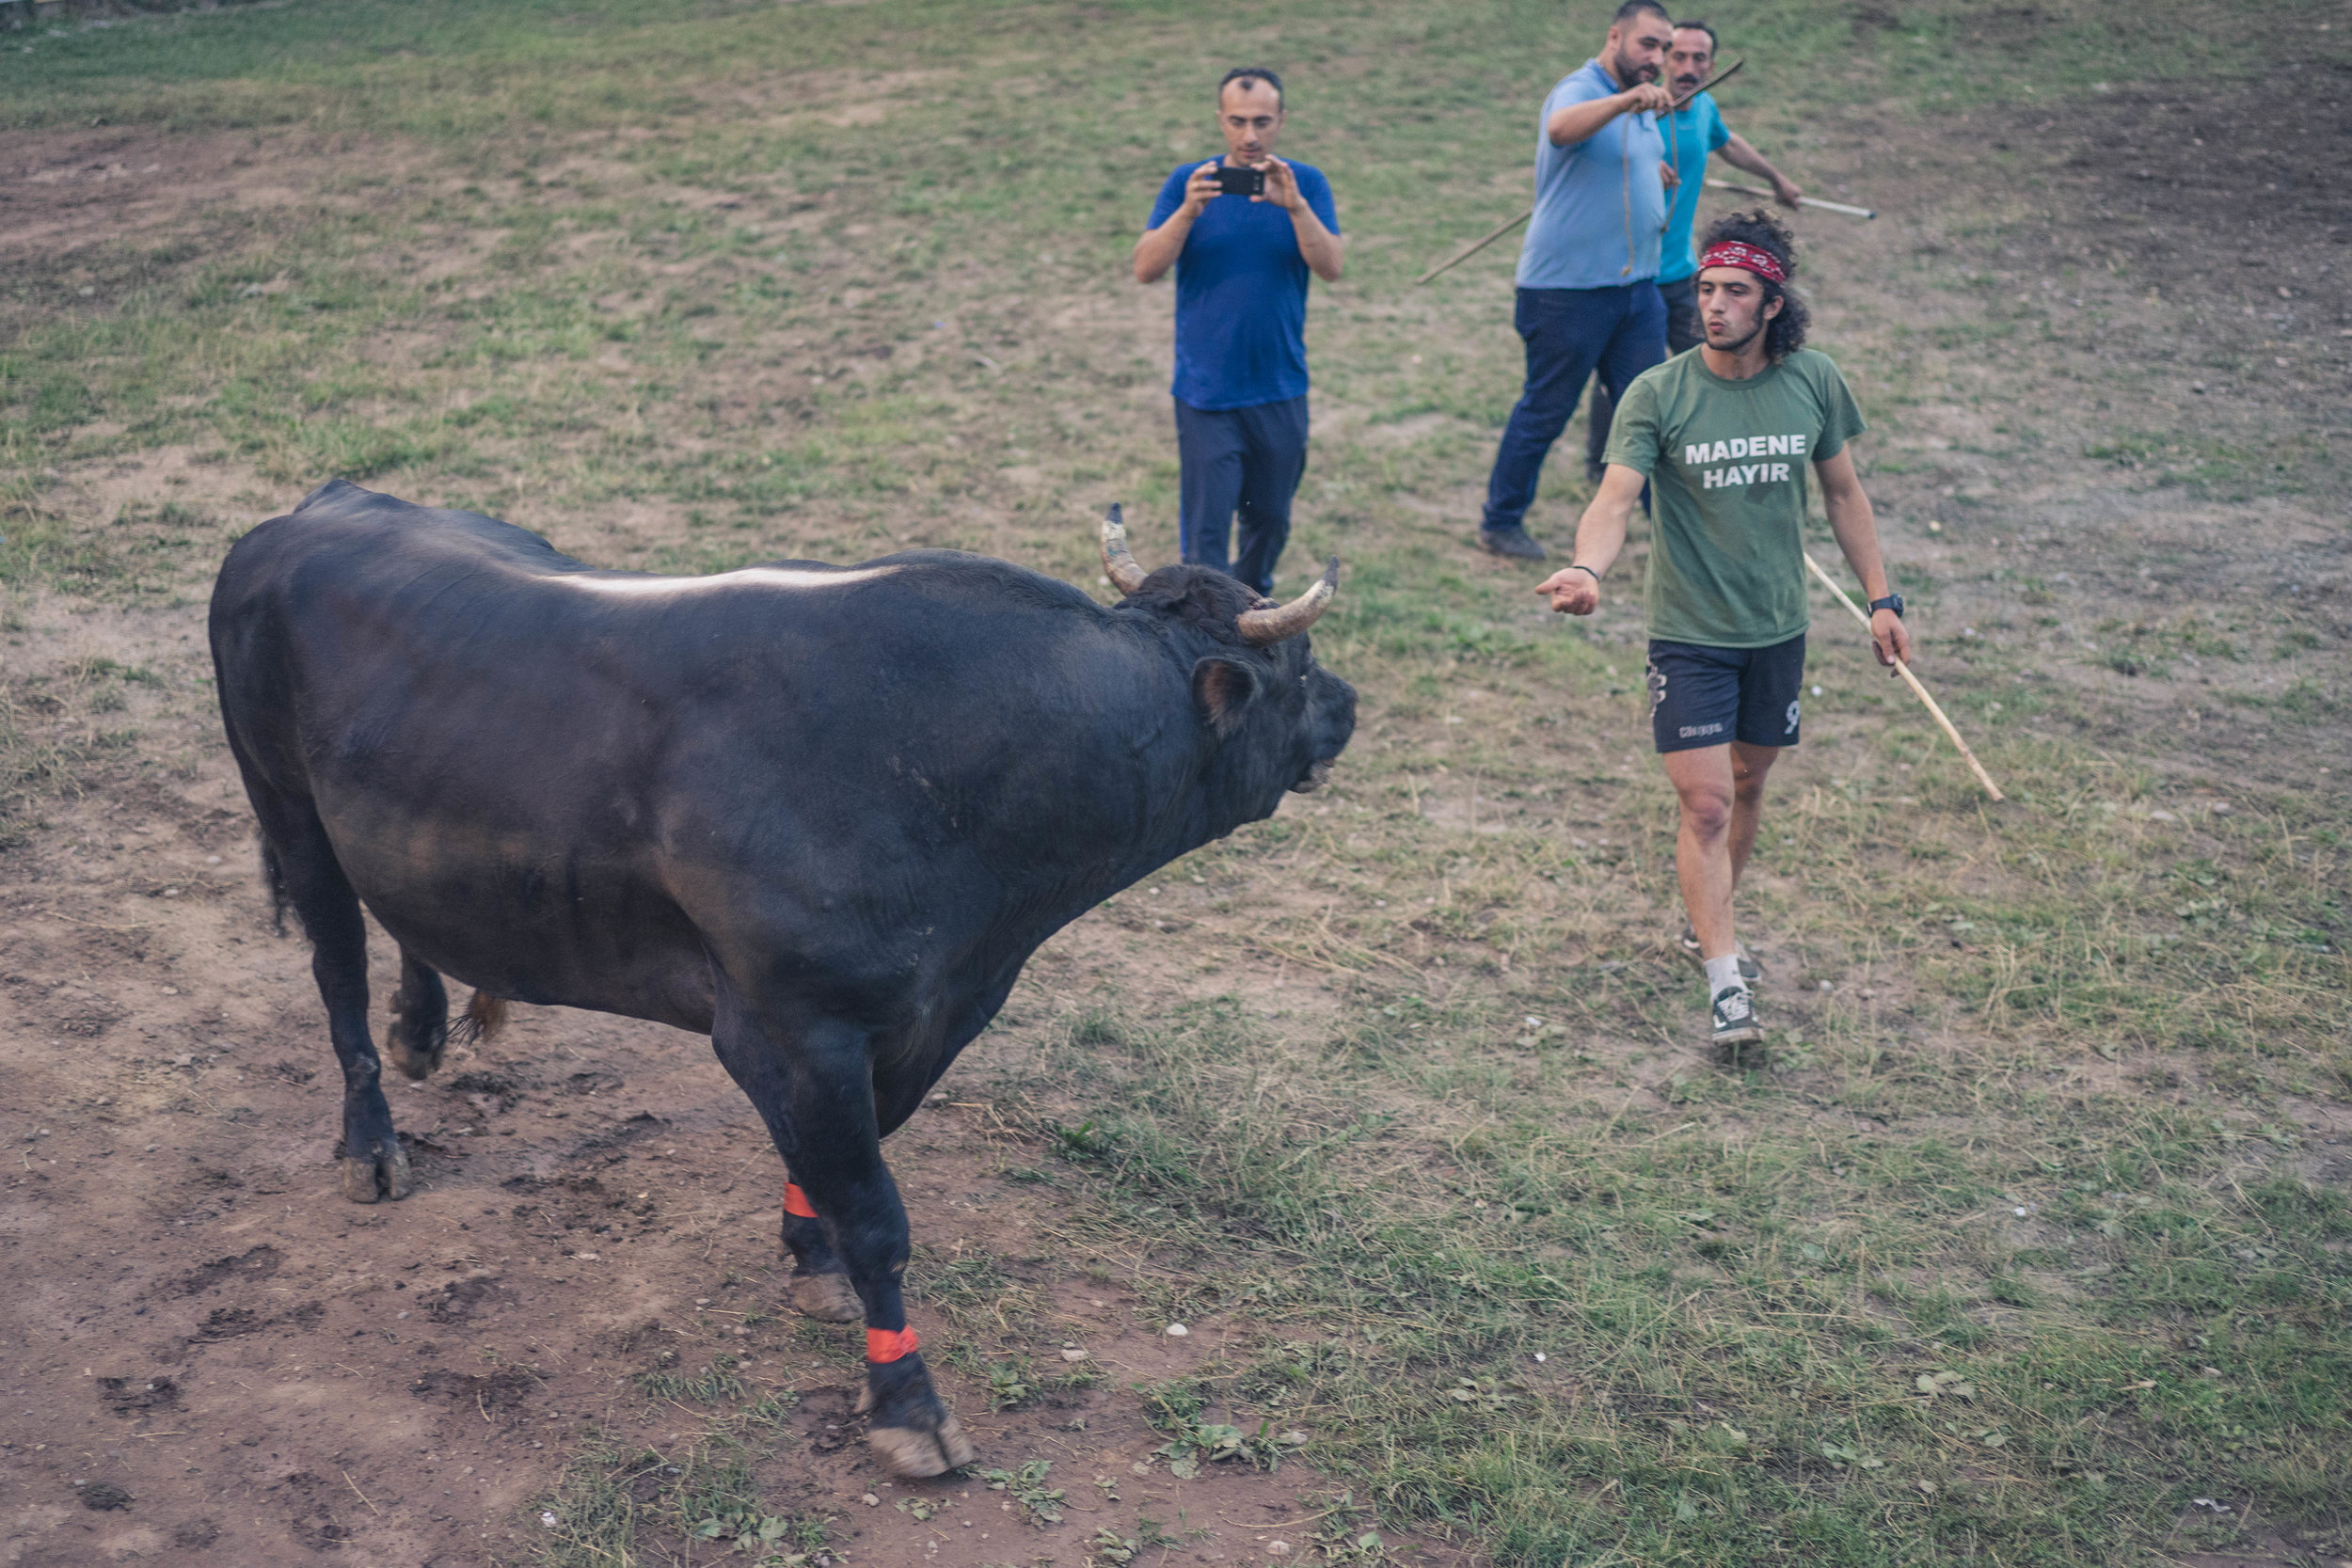 1 ton bull, no worries mate, Kafkasör 2018, Artvin